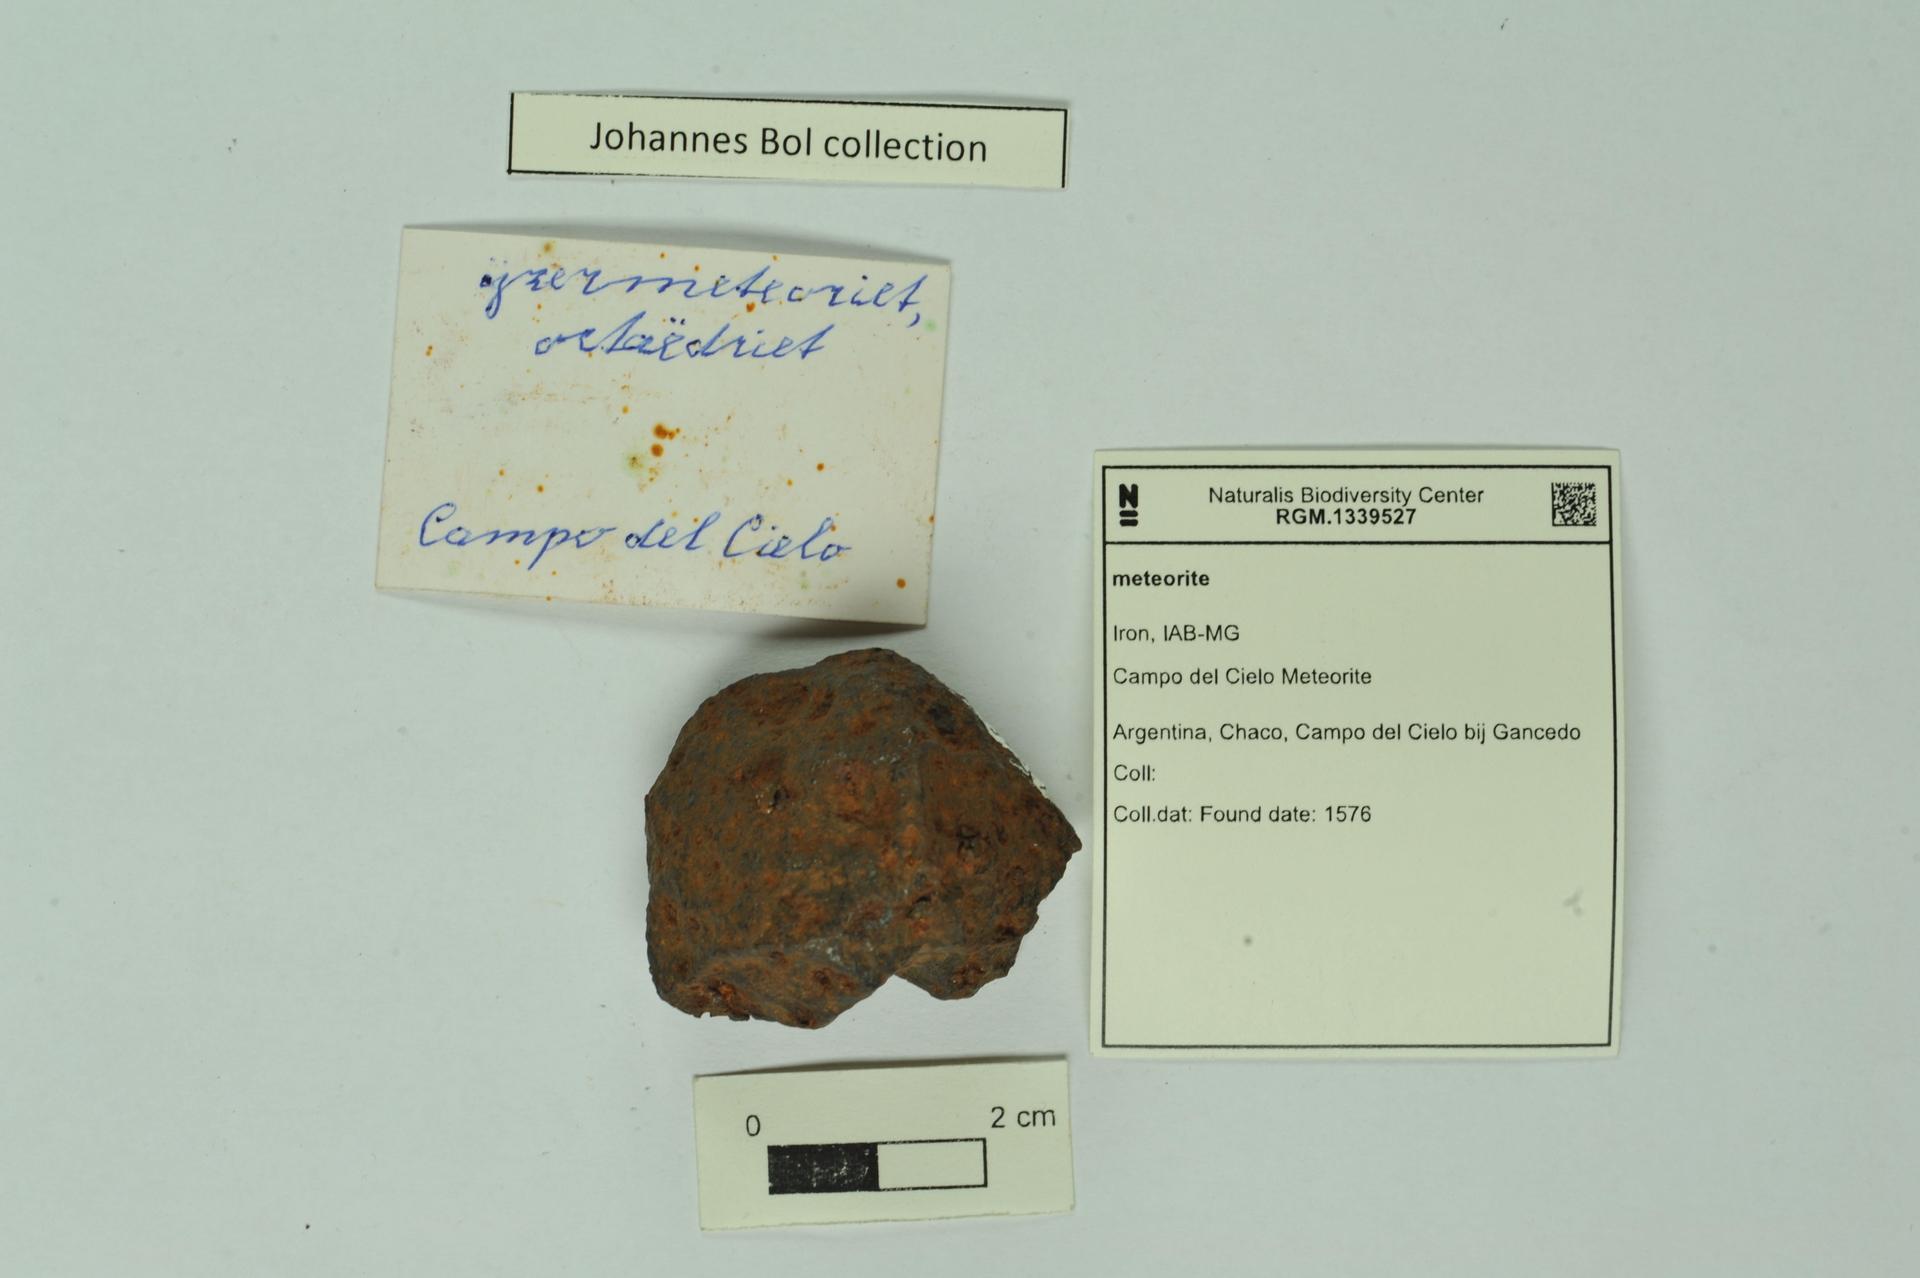 RGM.1339527 | Iron, IAB-MG